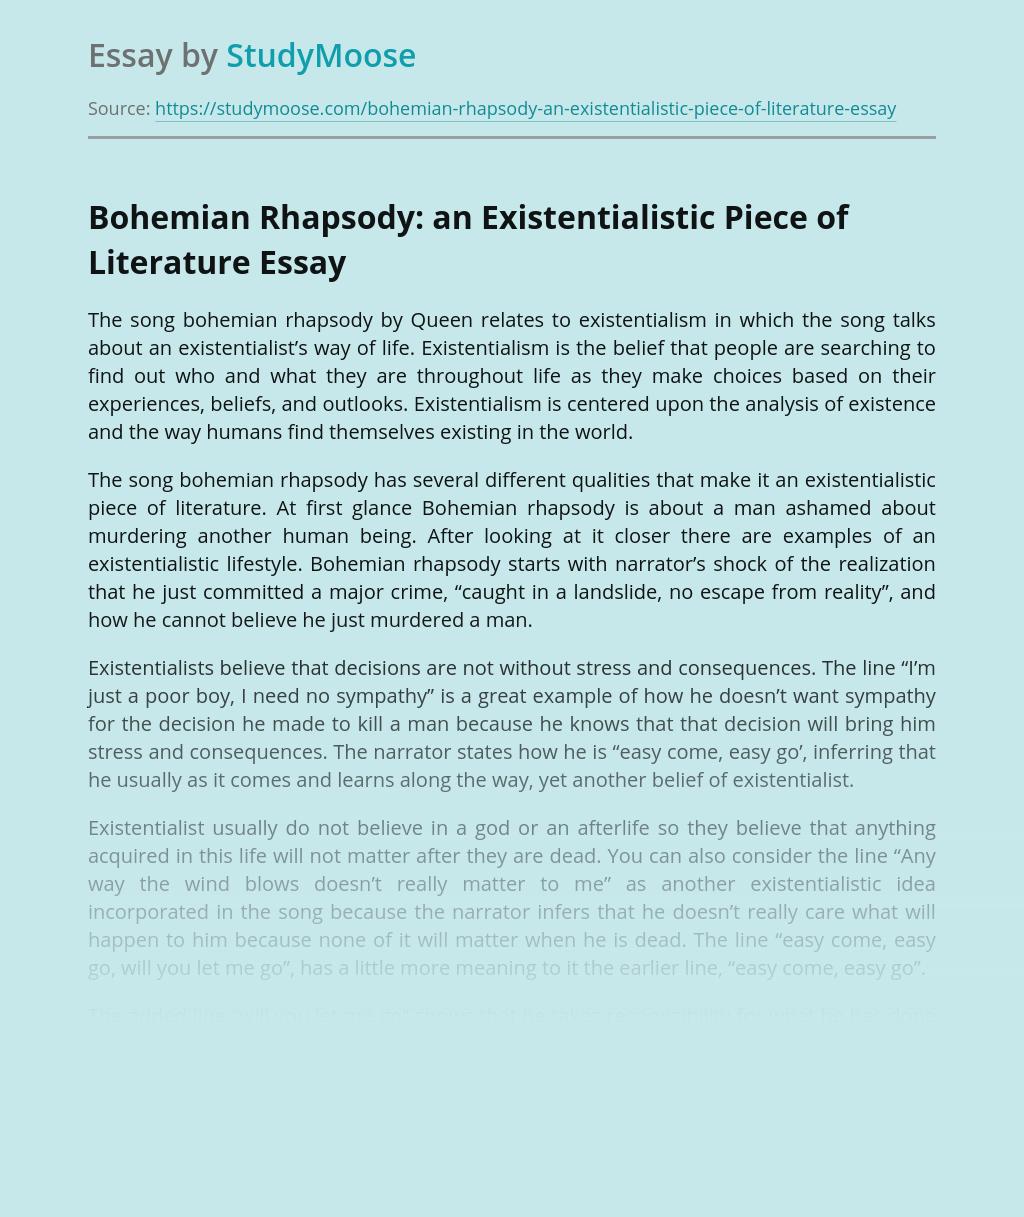 Bohemian Rhapsody: an Existentialistic Piece of Literature